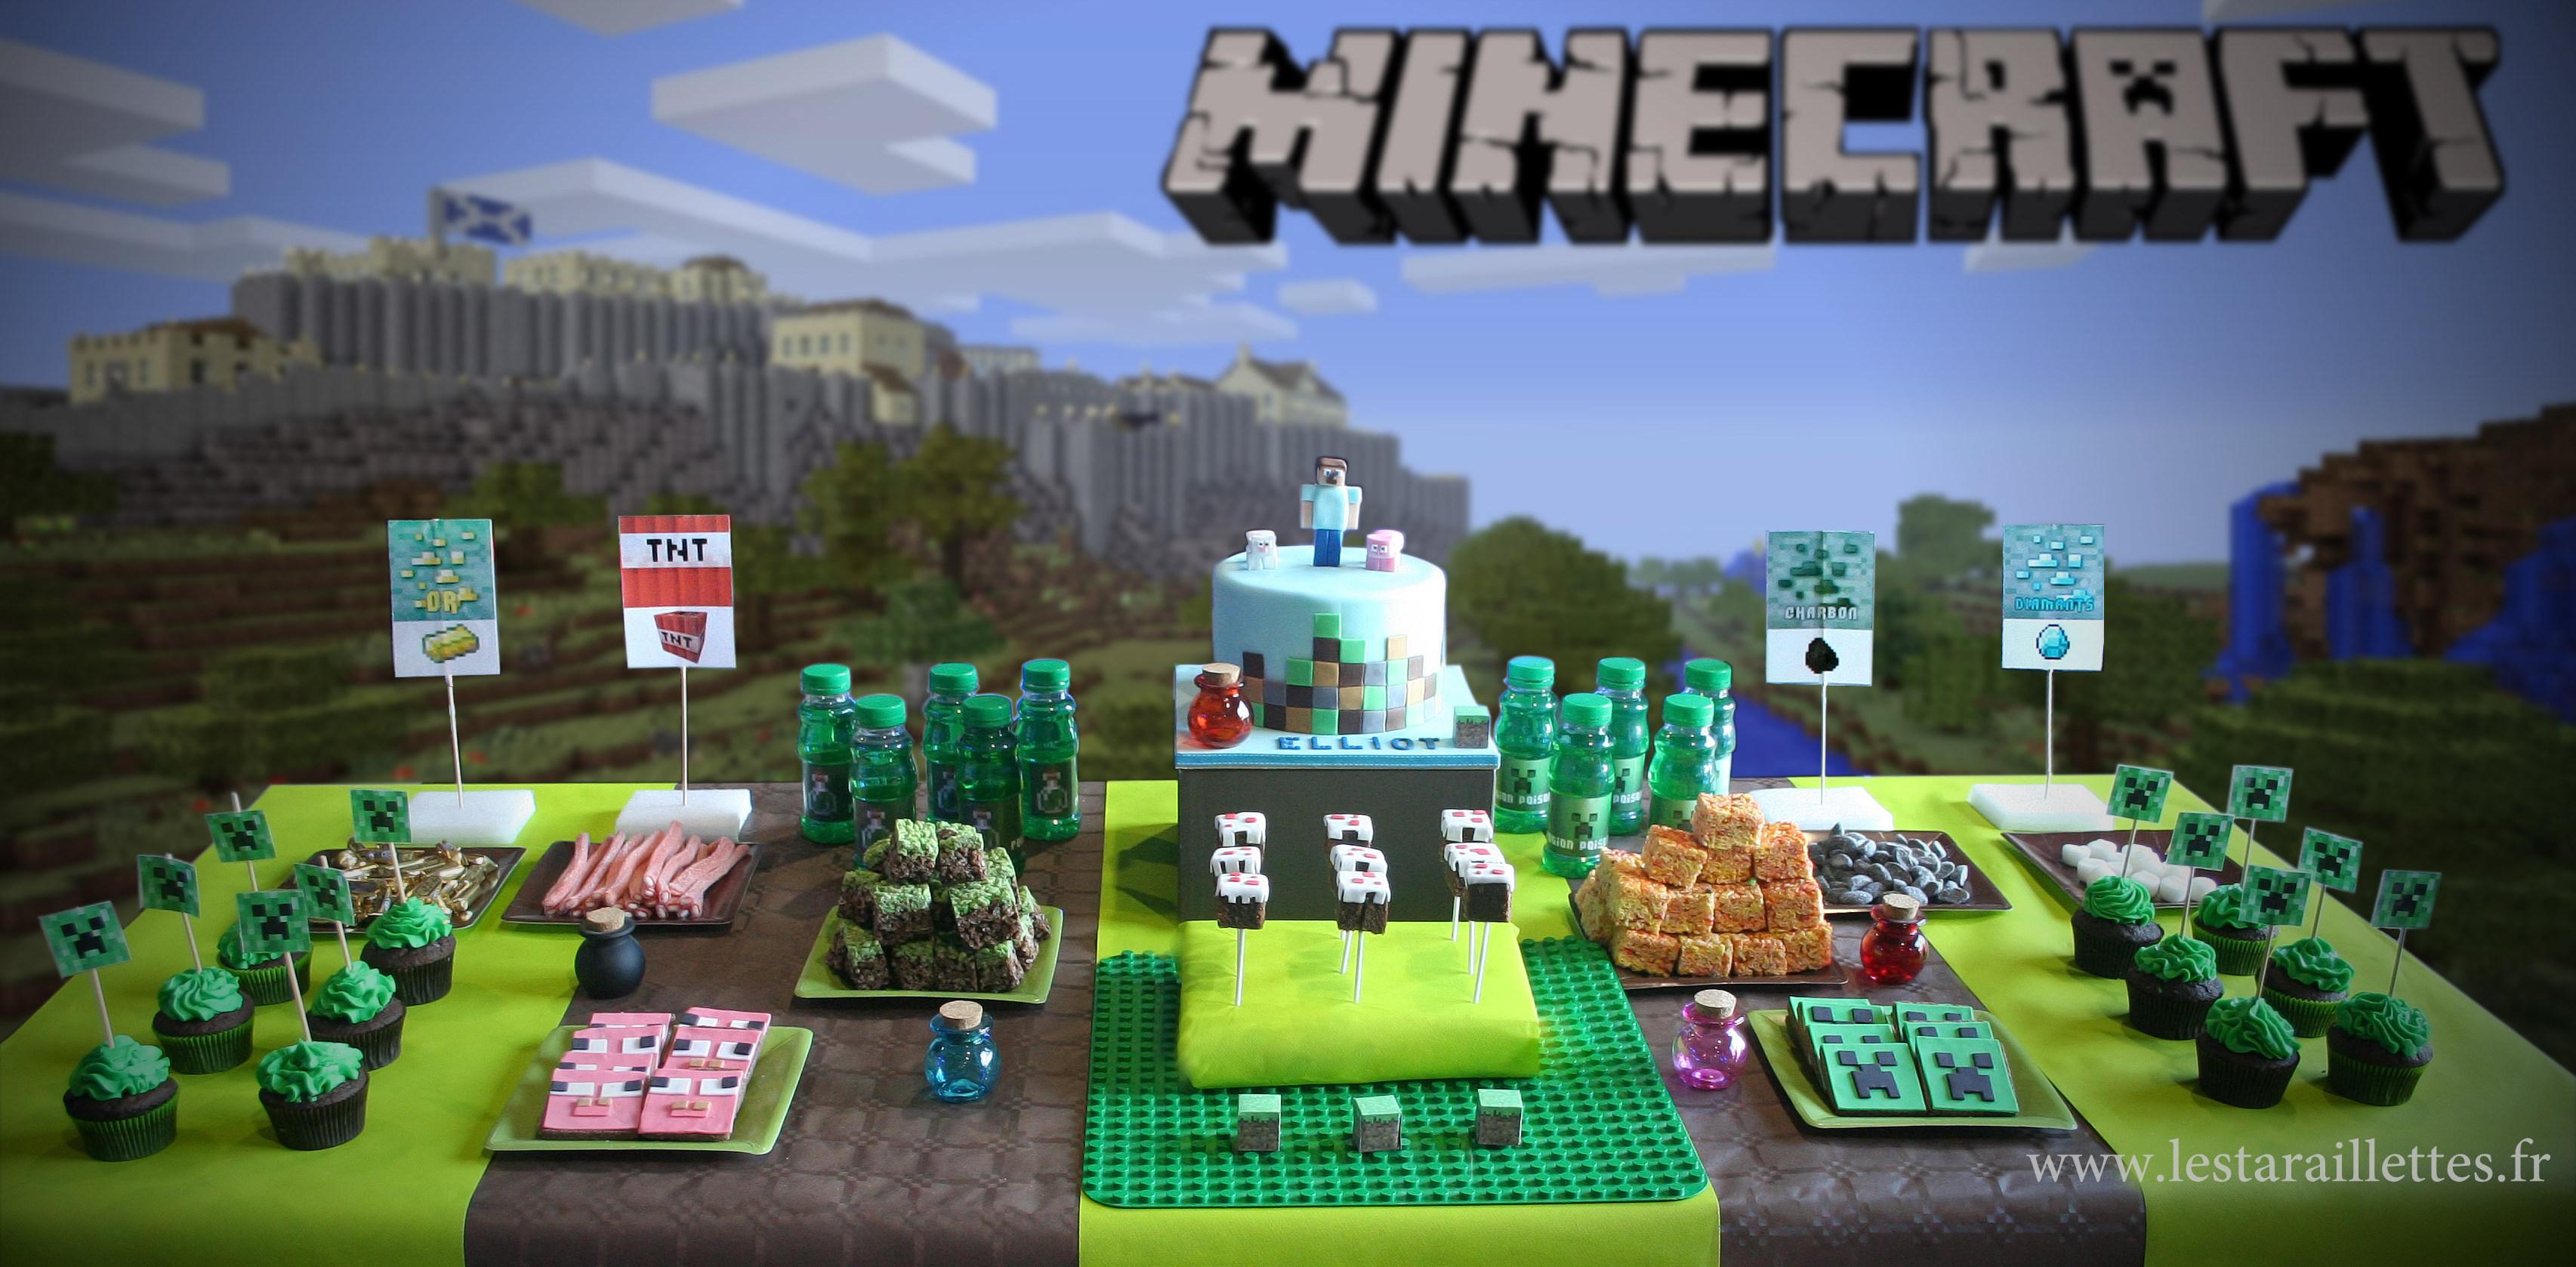 sweet table minecraft les taraillettes cooking mumu. Black Bedroom Furniture Sets. Home Design Ideas